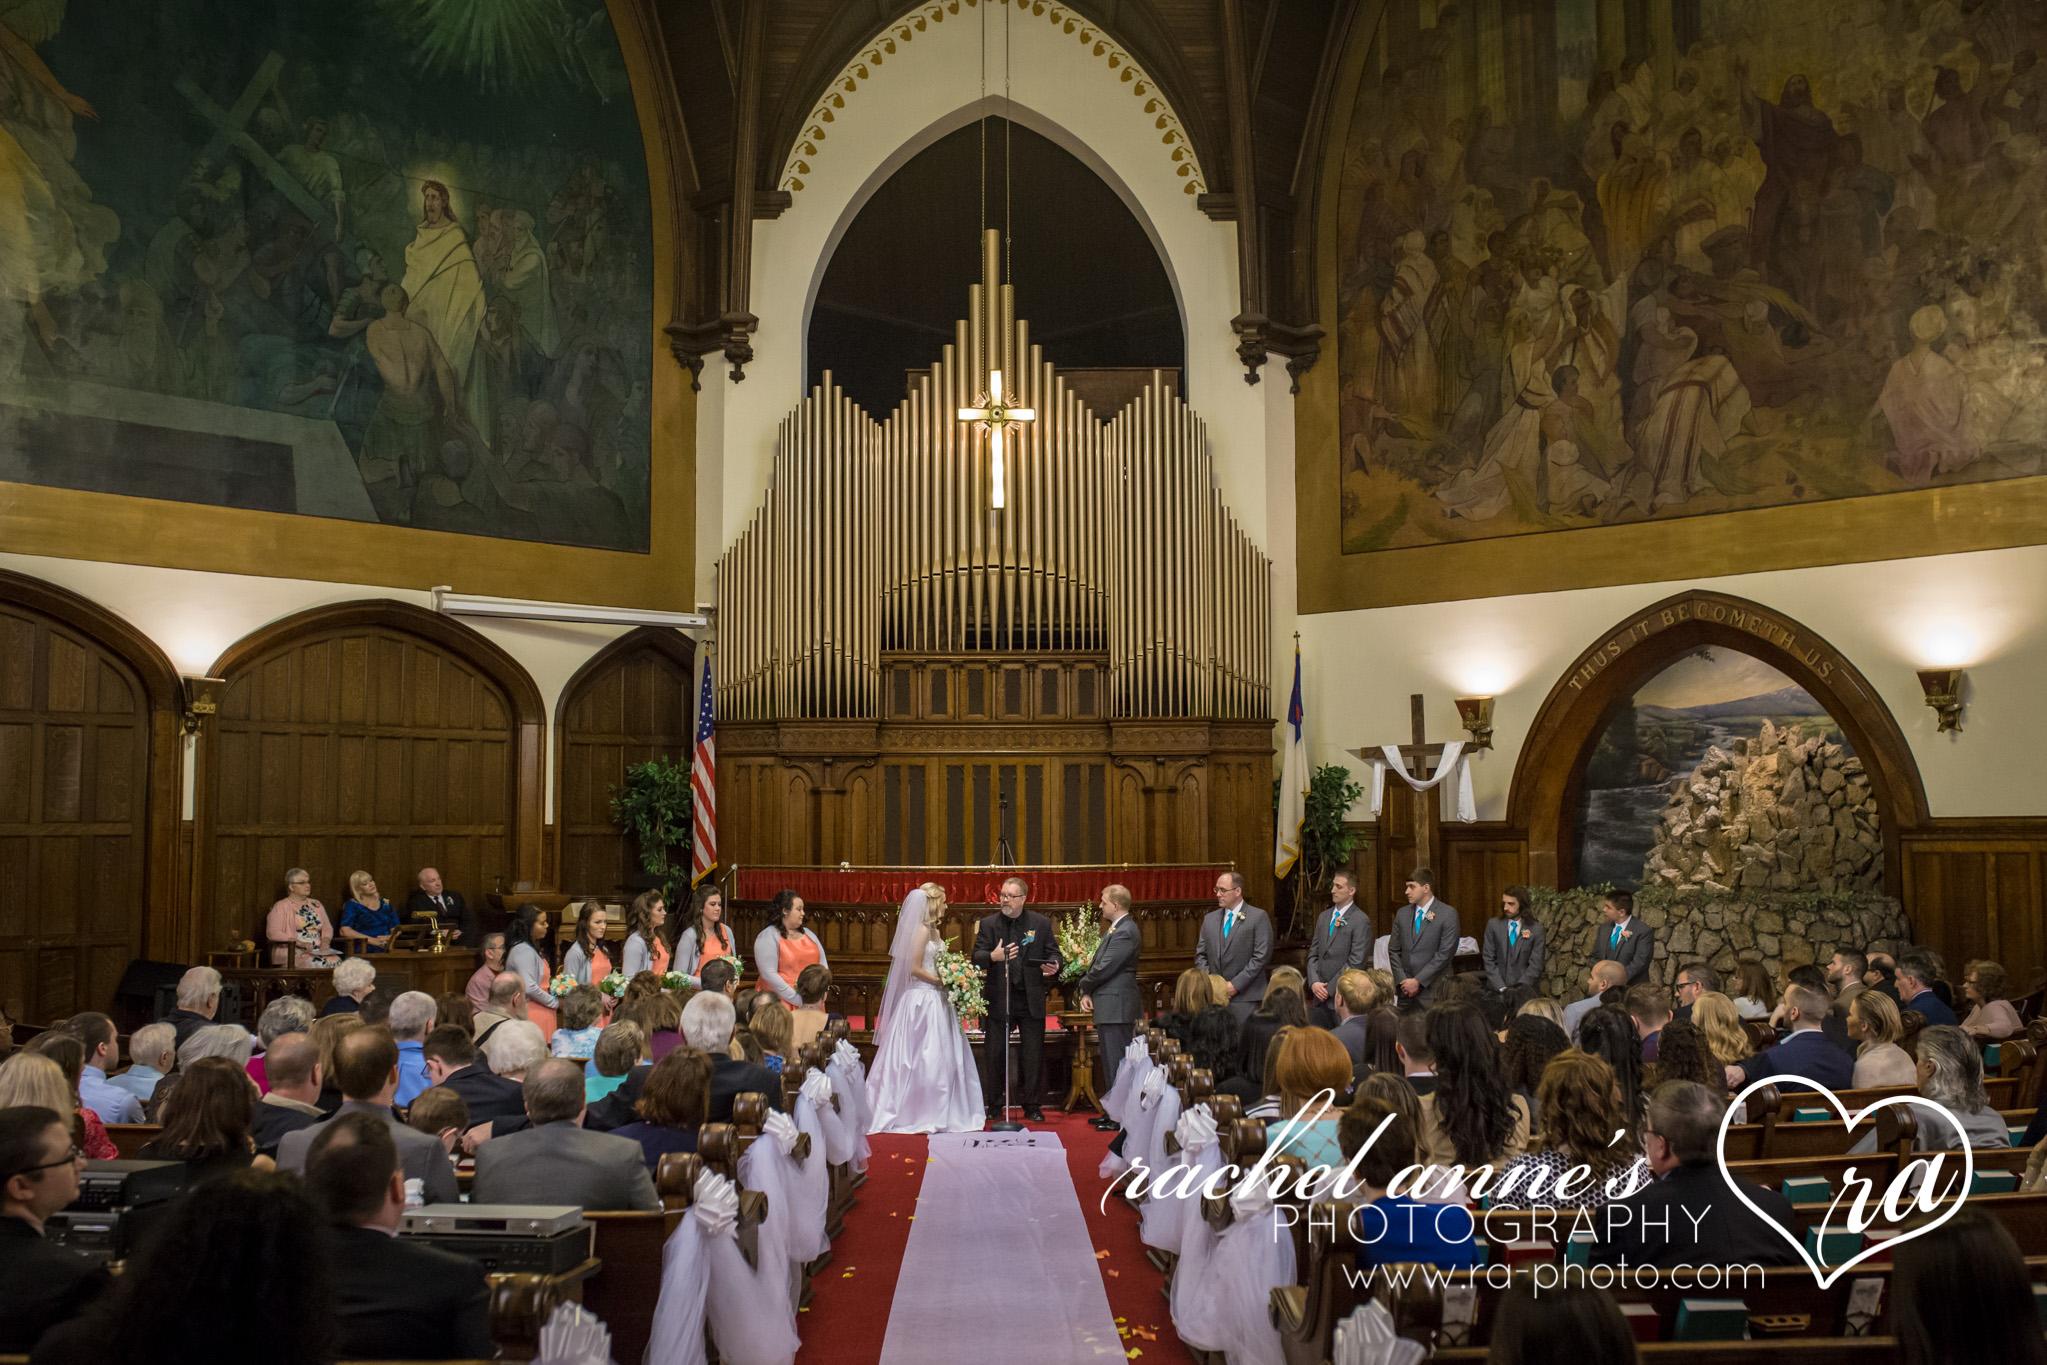 022-JKS-WEDDINGS-THE-FRANKLIN-PA.jpg